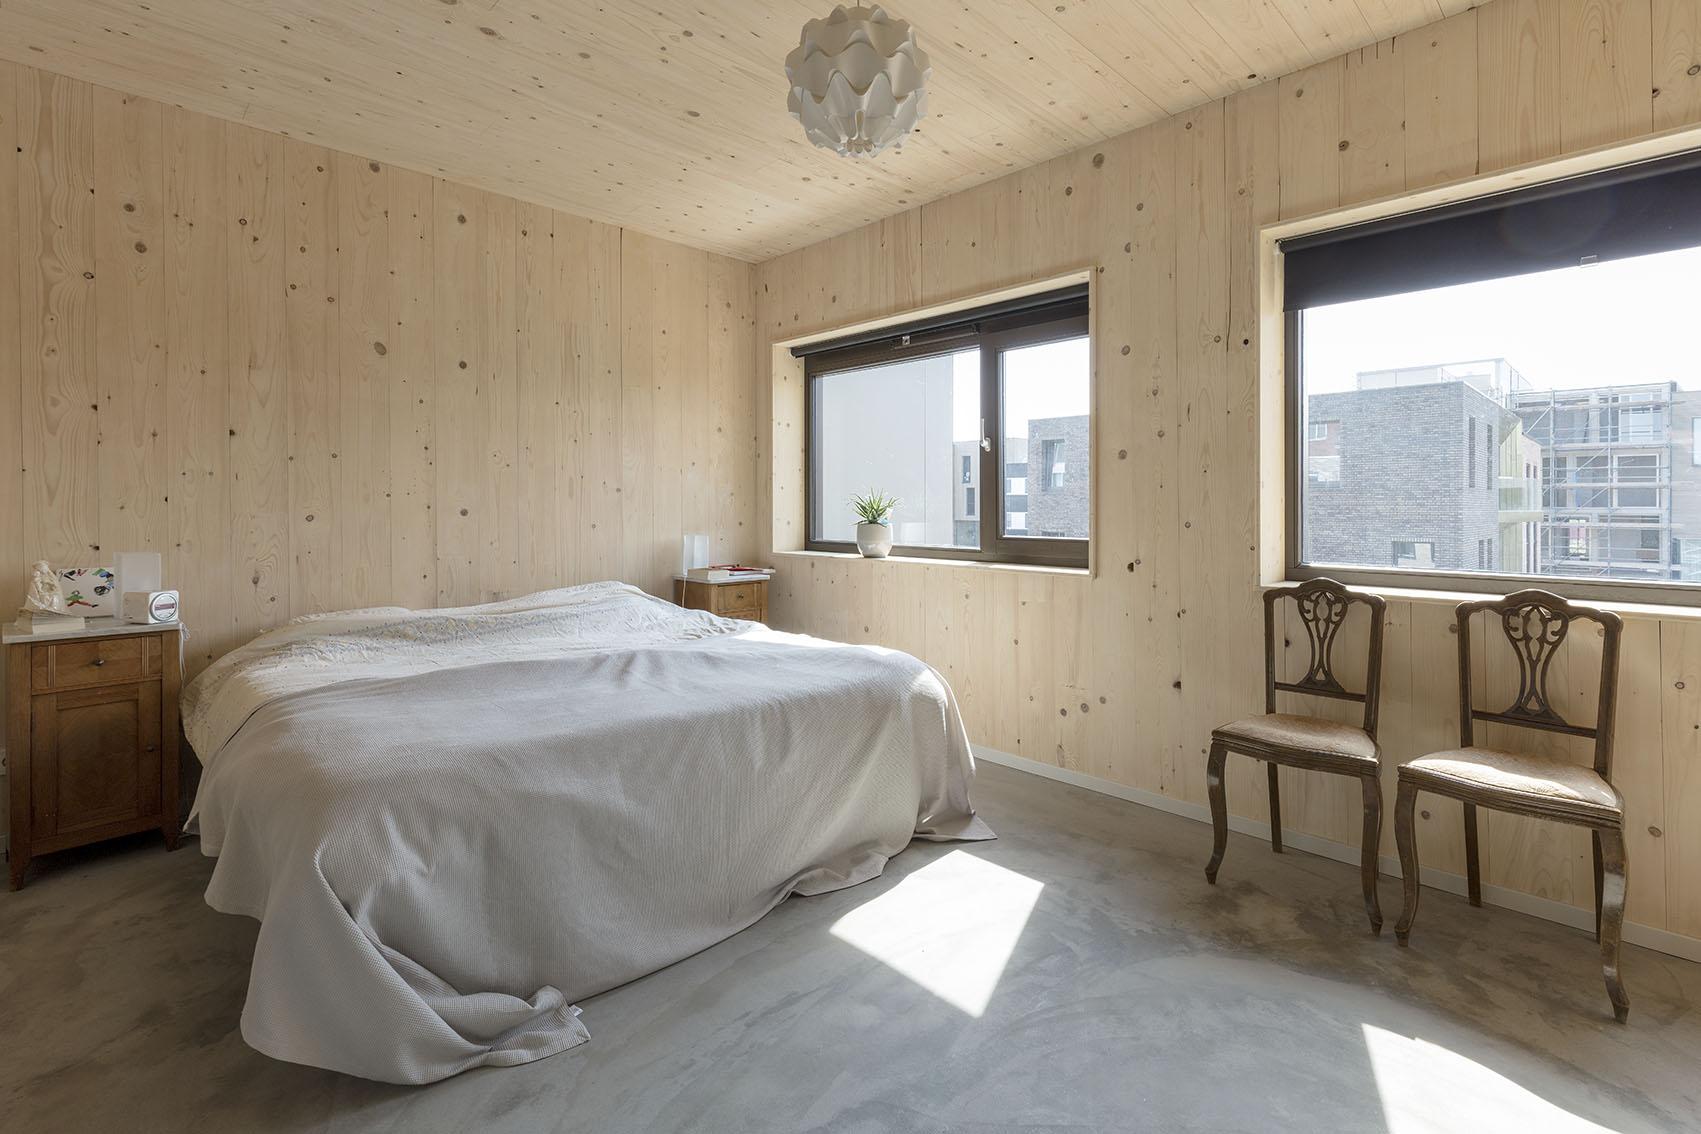 <p>Kavel 8 &#8211; slaapkamer foto: Marcel van der Burg</p>